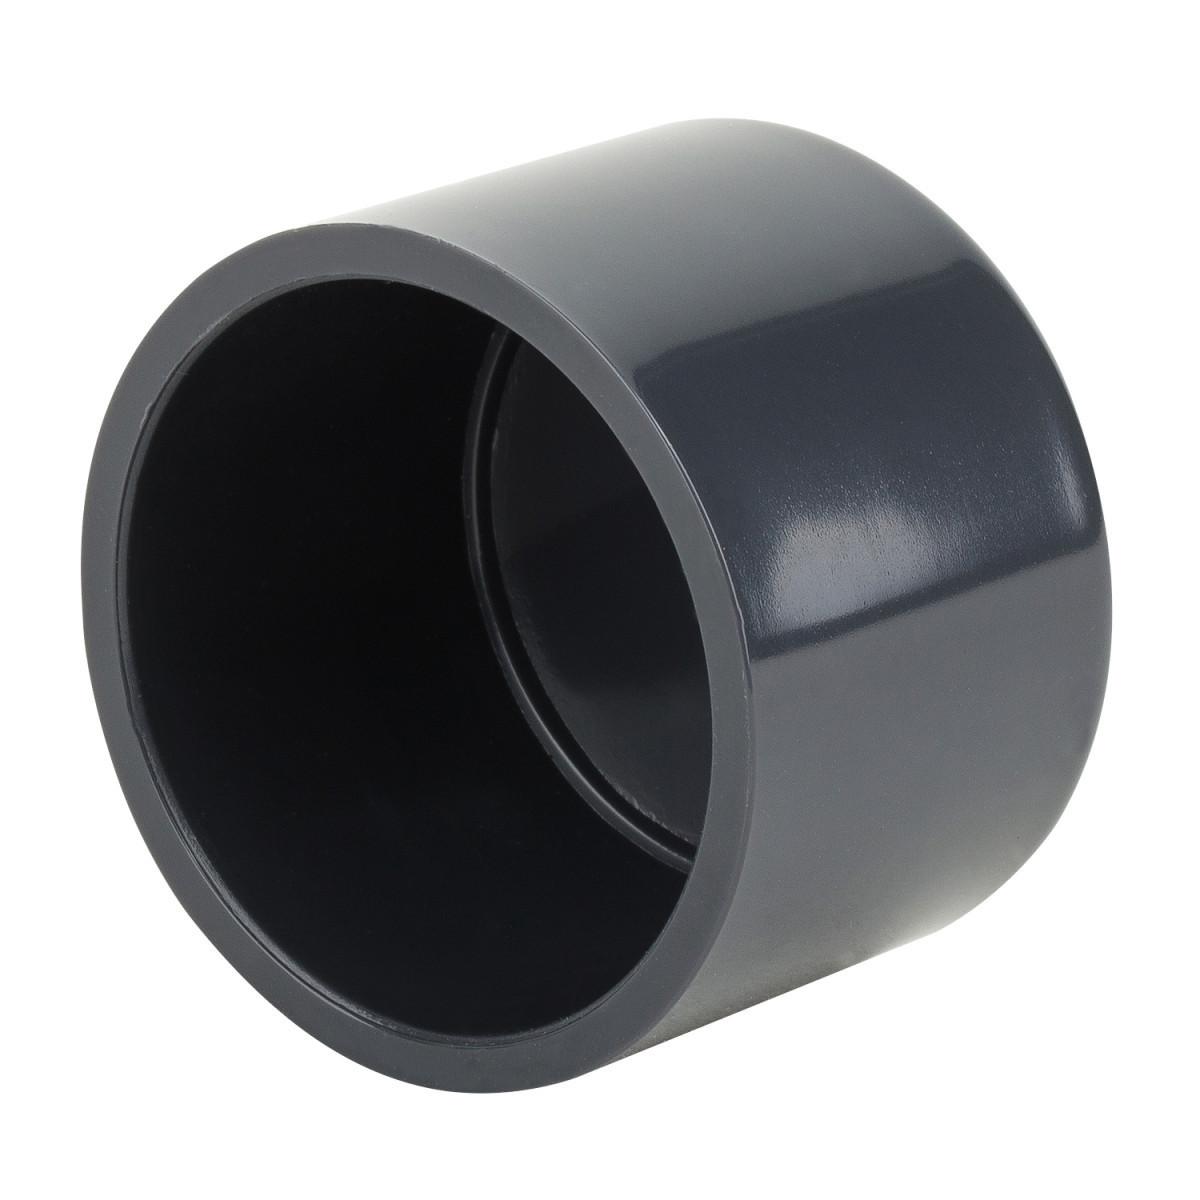 Заглушка ПВХ ERA клеевая, диаметр 140 мм.